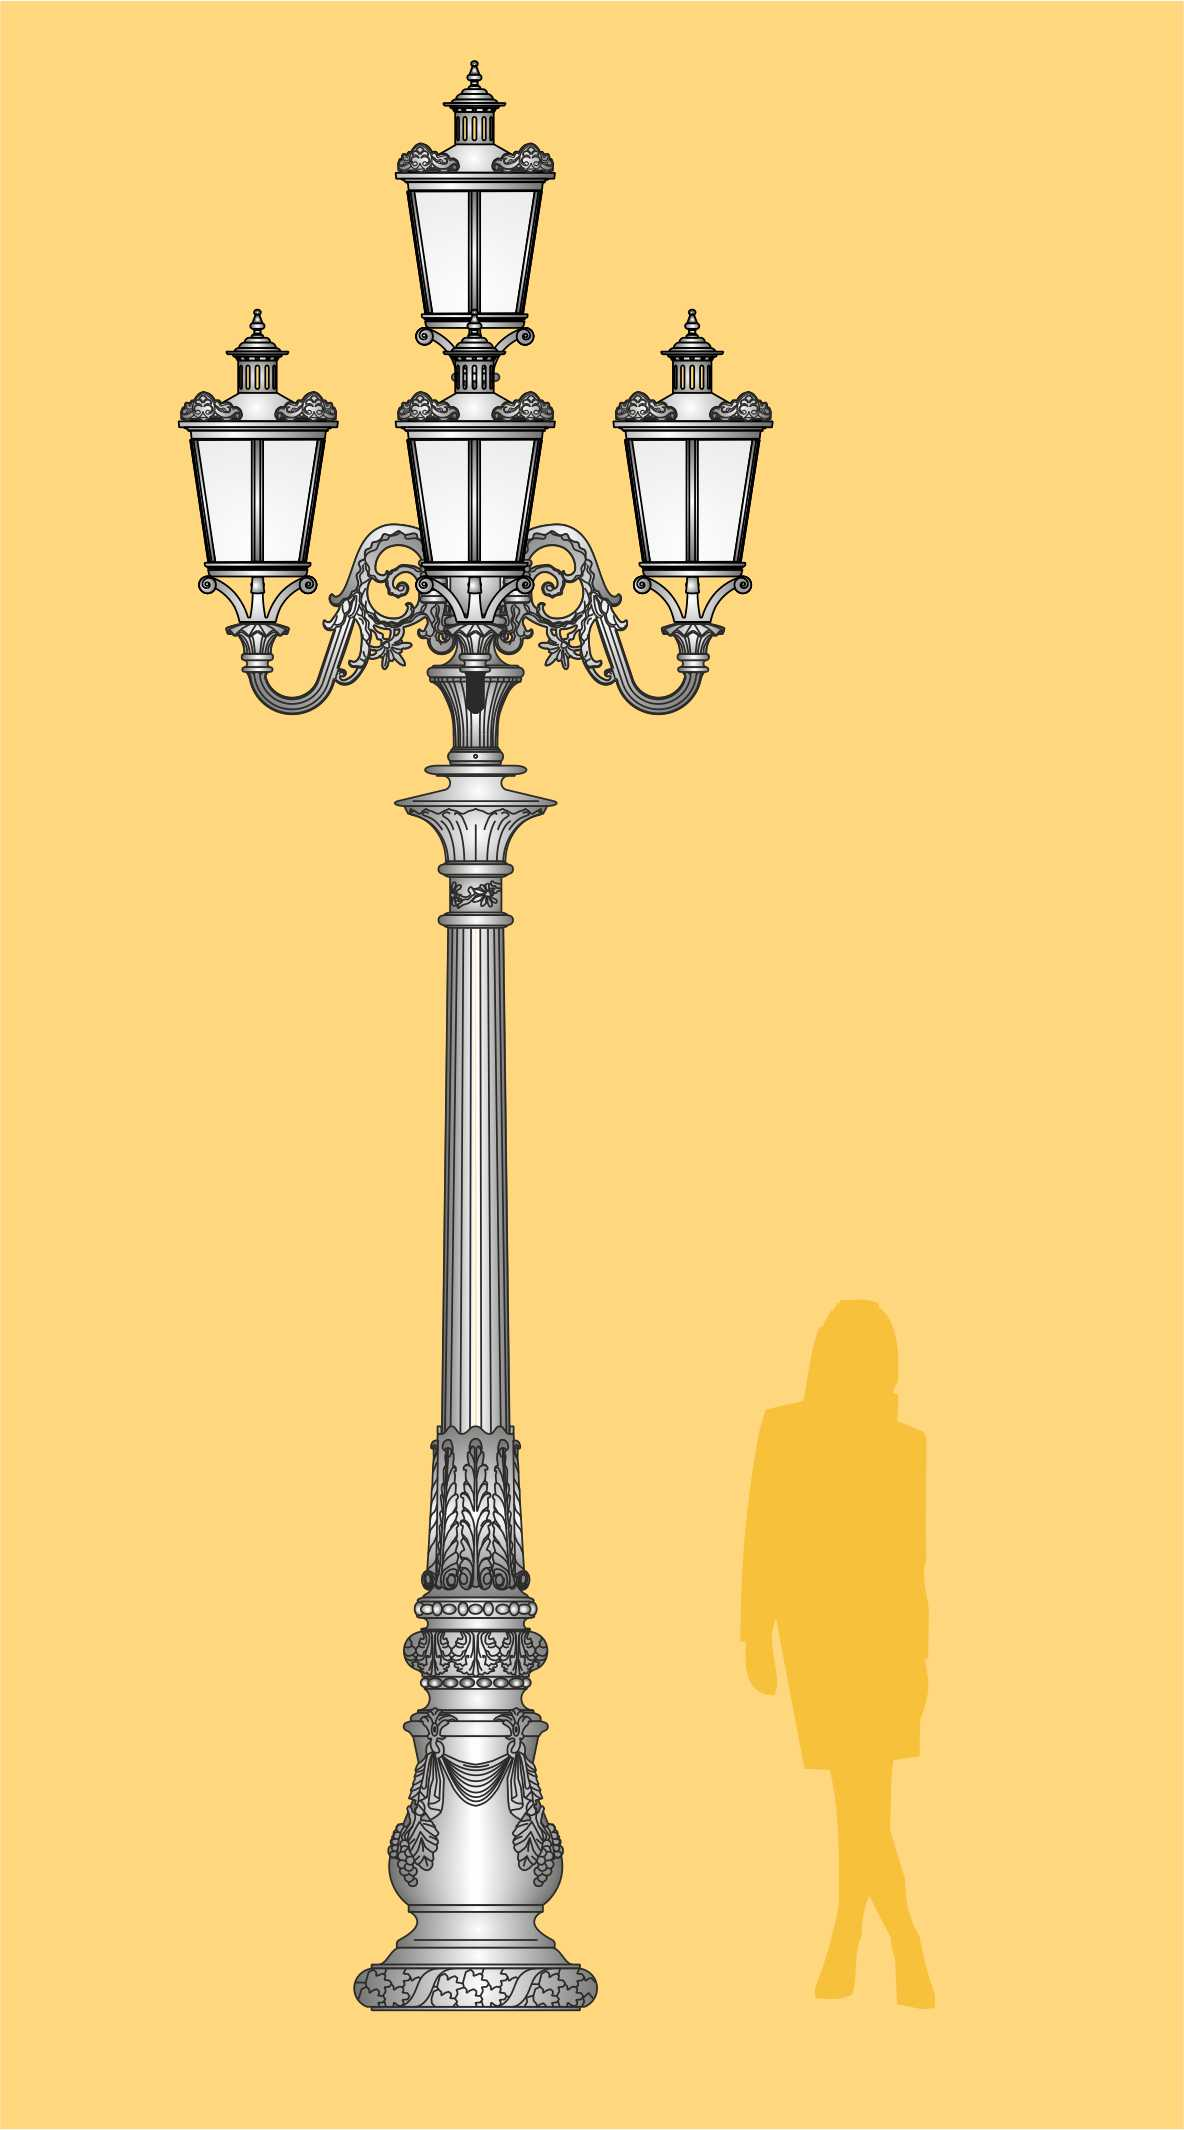 latarnia stylowa, latarnia LED, ekskluzywna latarnia ogrodowa